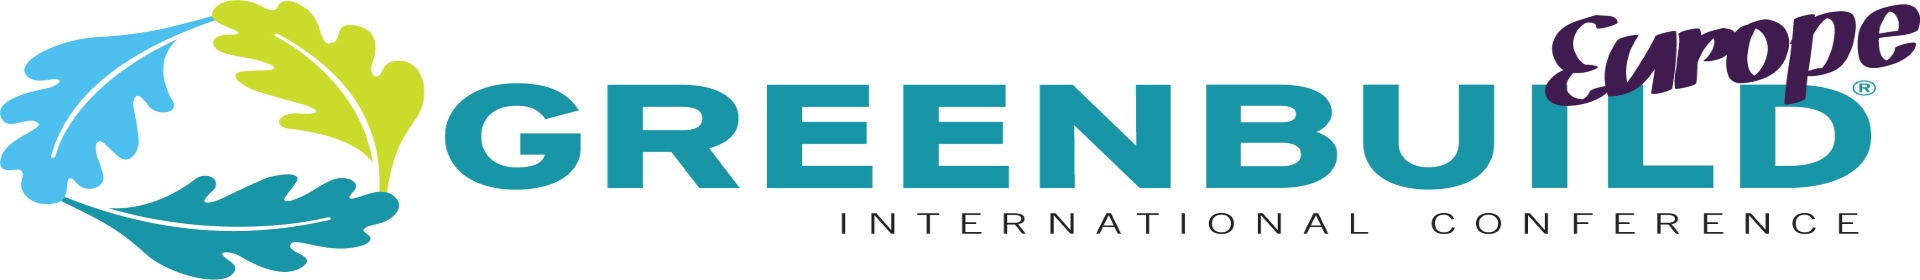 Greenbuild Europe 2020 Event Banner